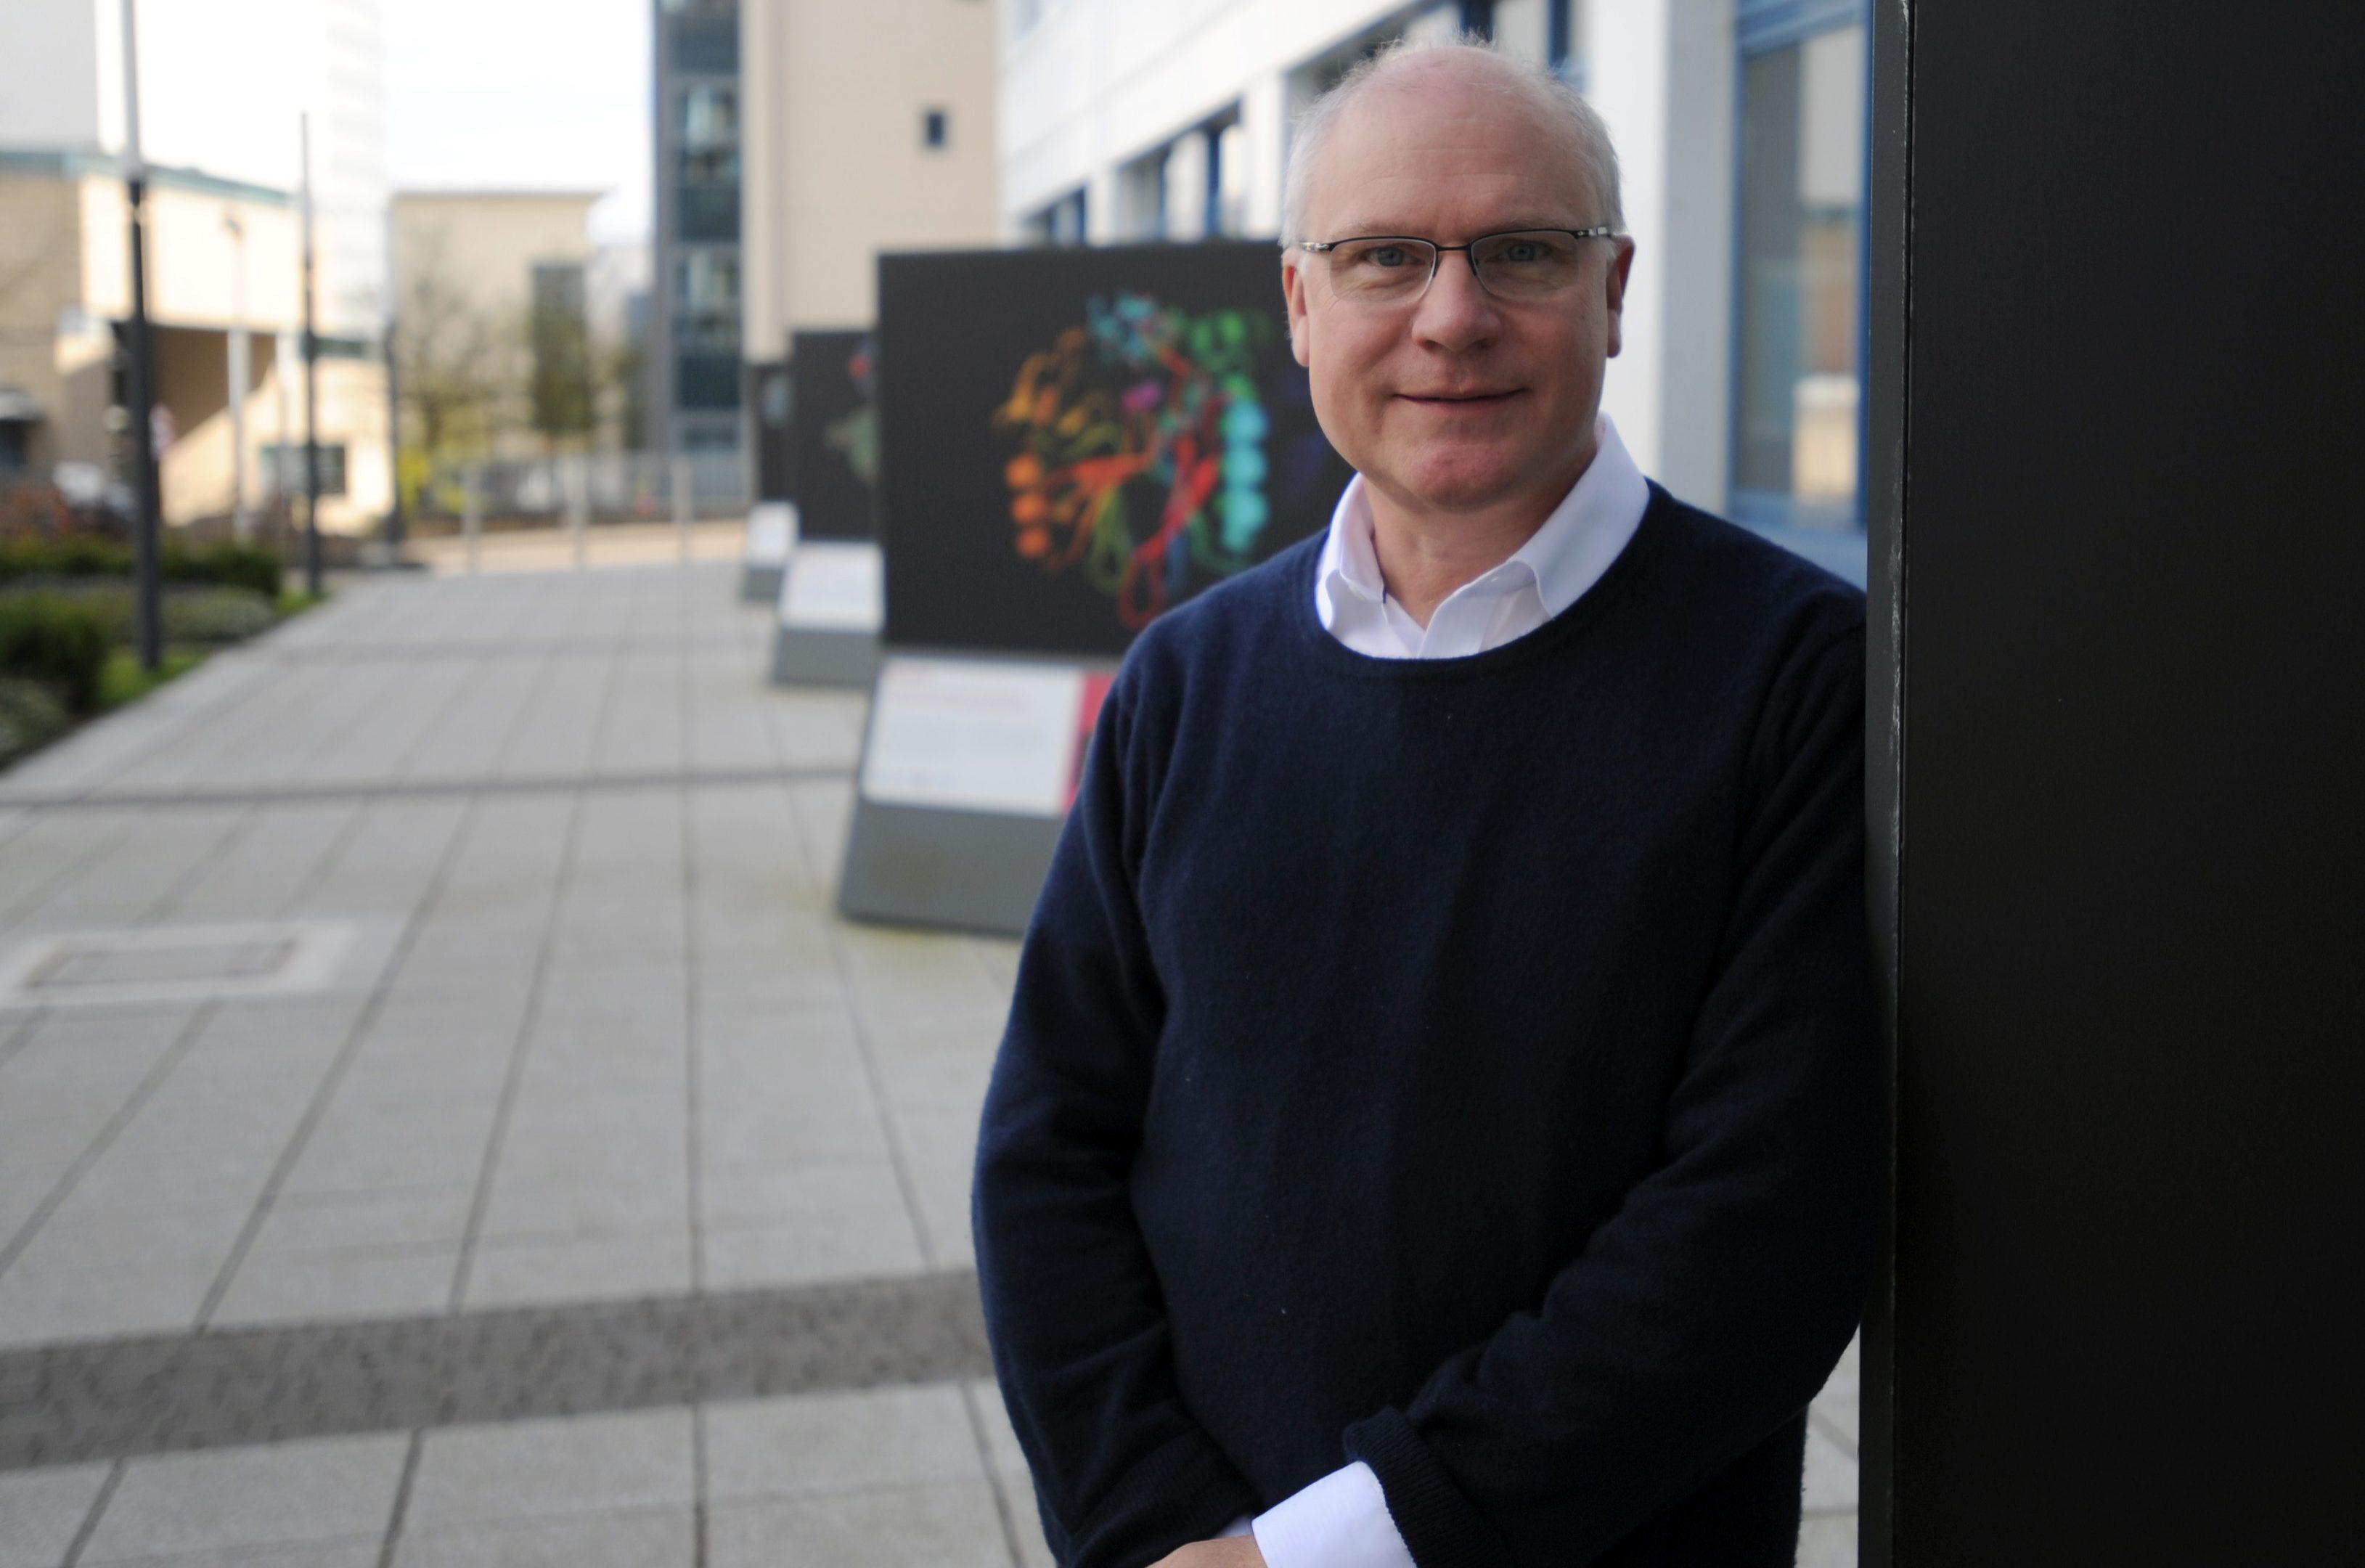 Professor Mike Ferguson of Dundee University